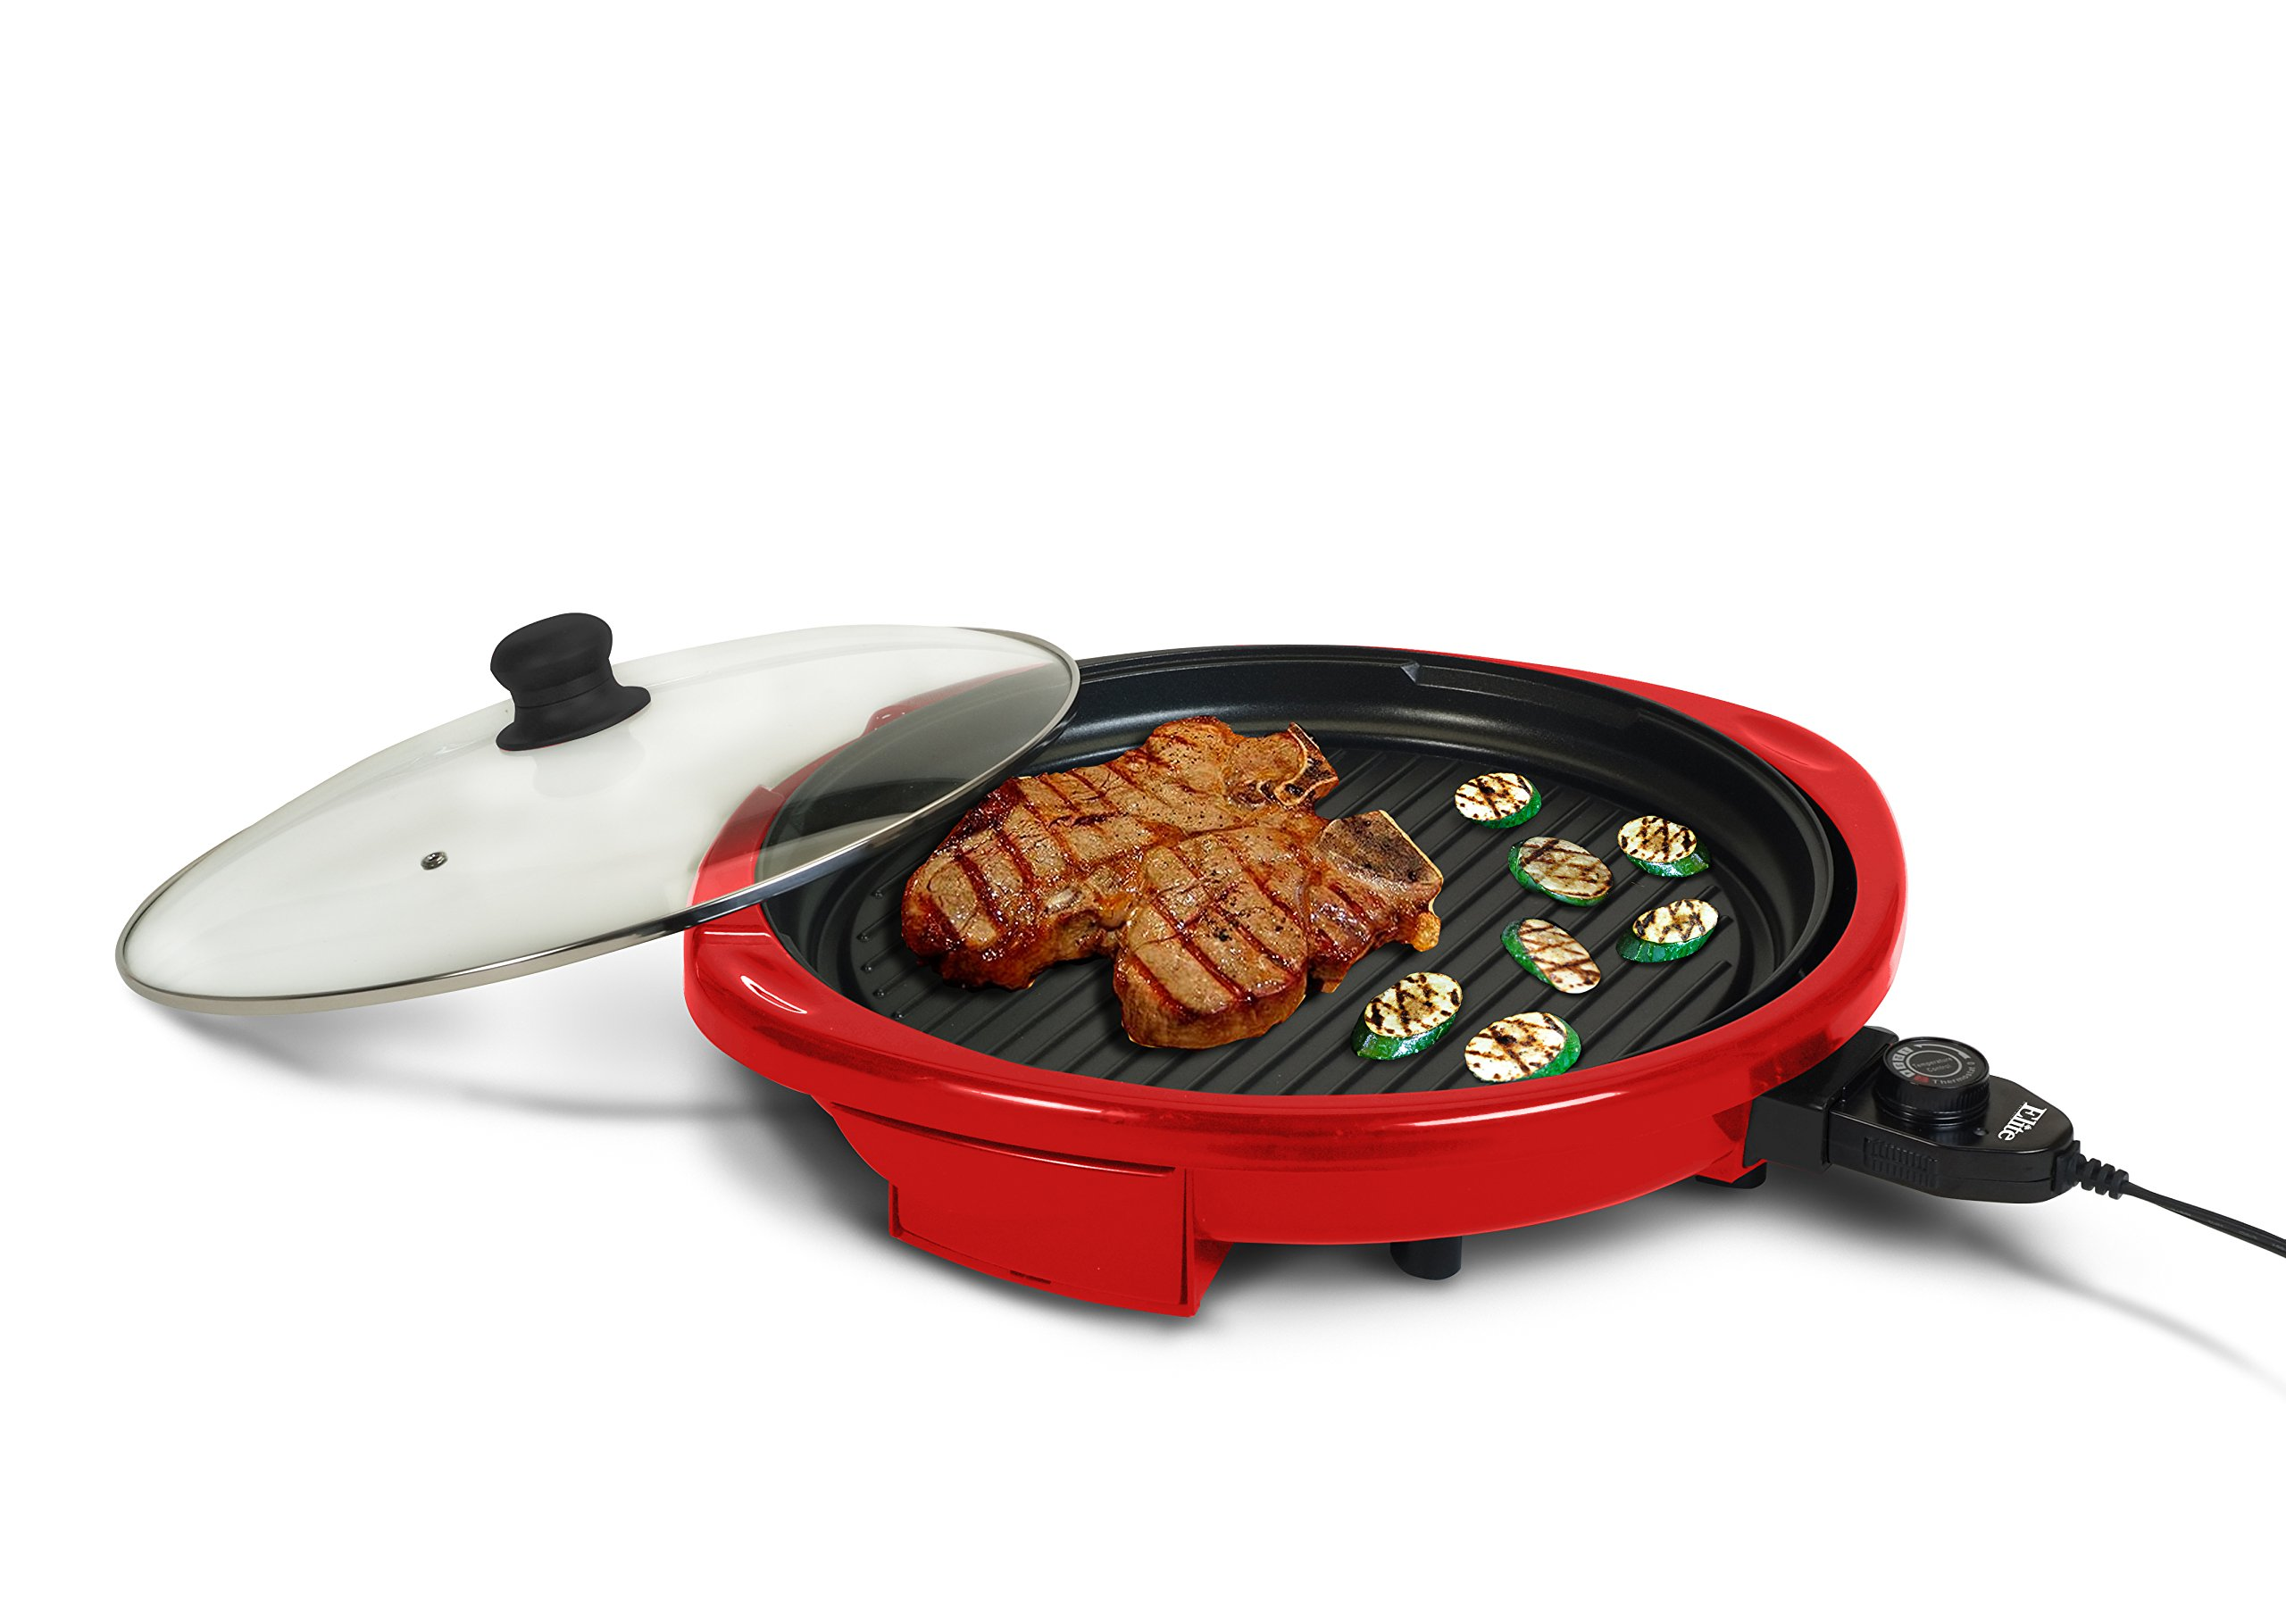 Elite Gourmet EMG-980R Indoor Grill, Red